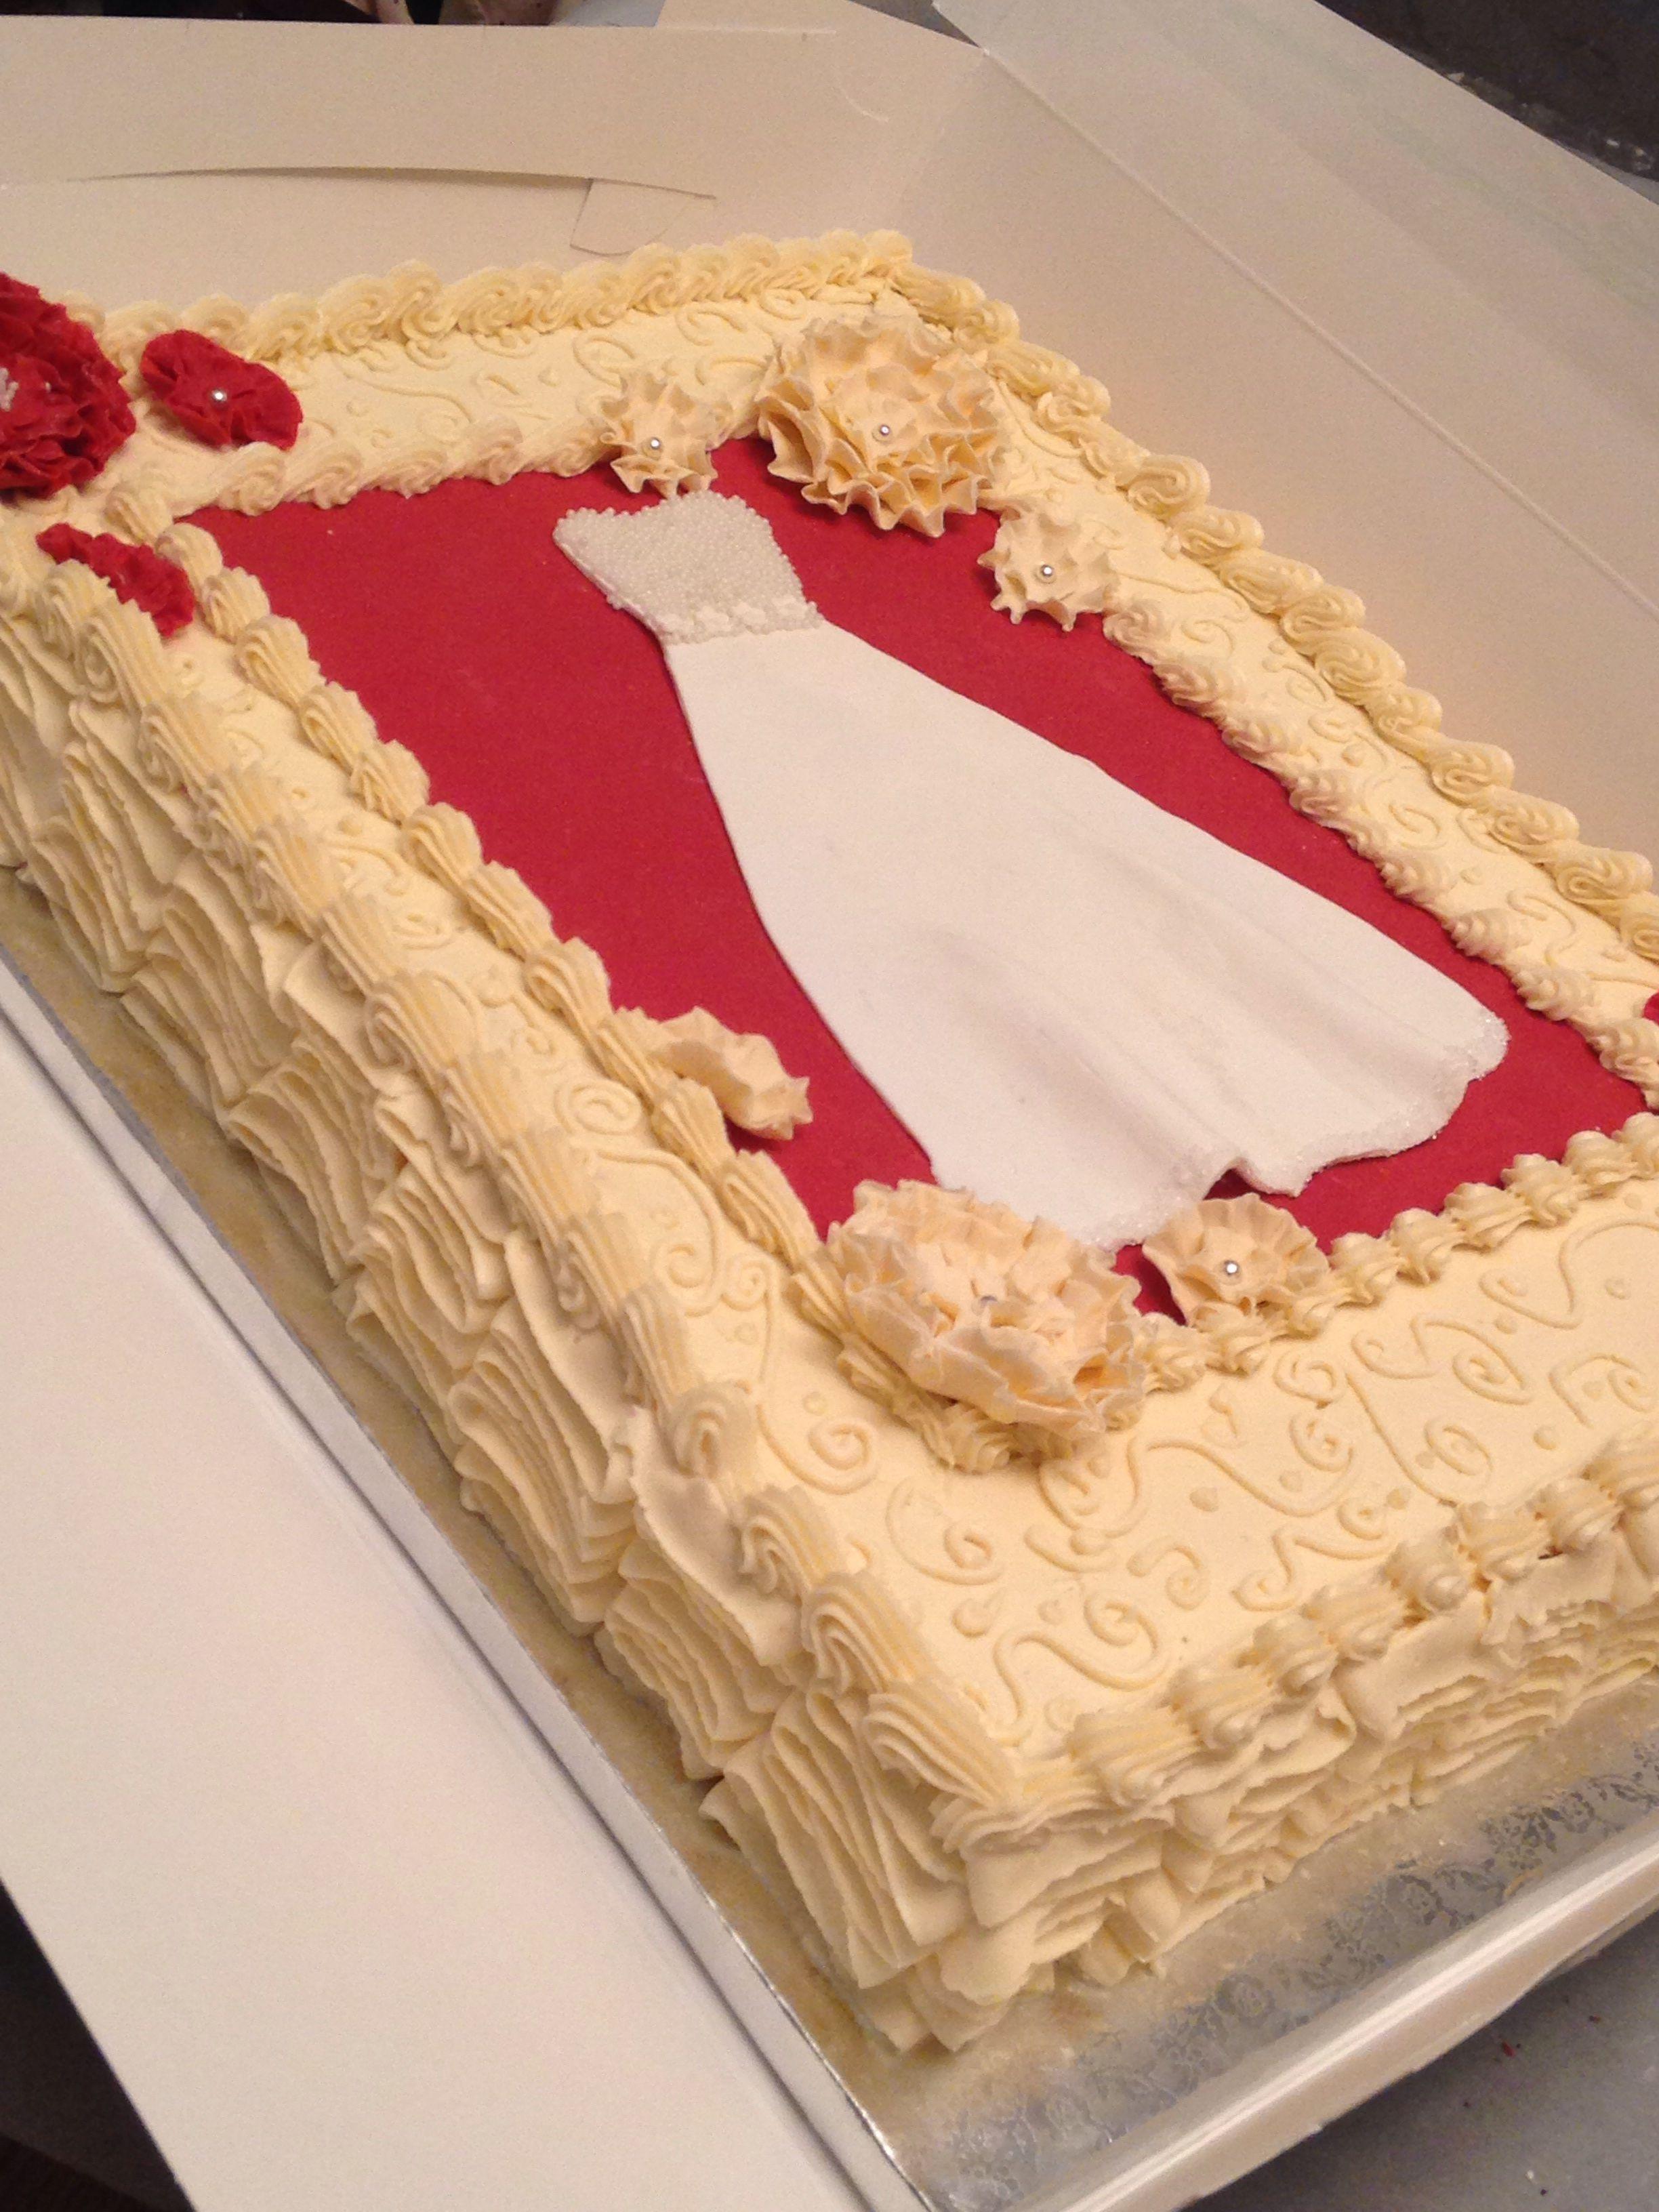 Bridal shower cake. Red velvet cake and cream cheese icing